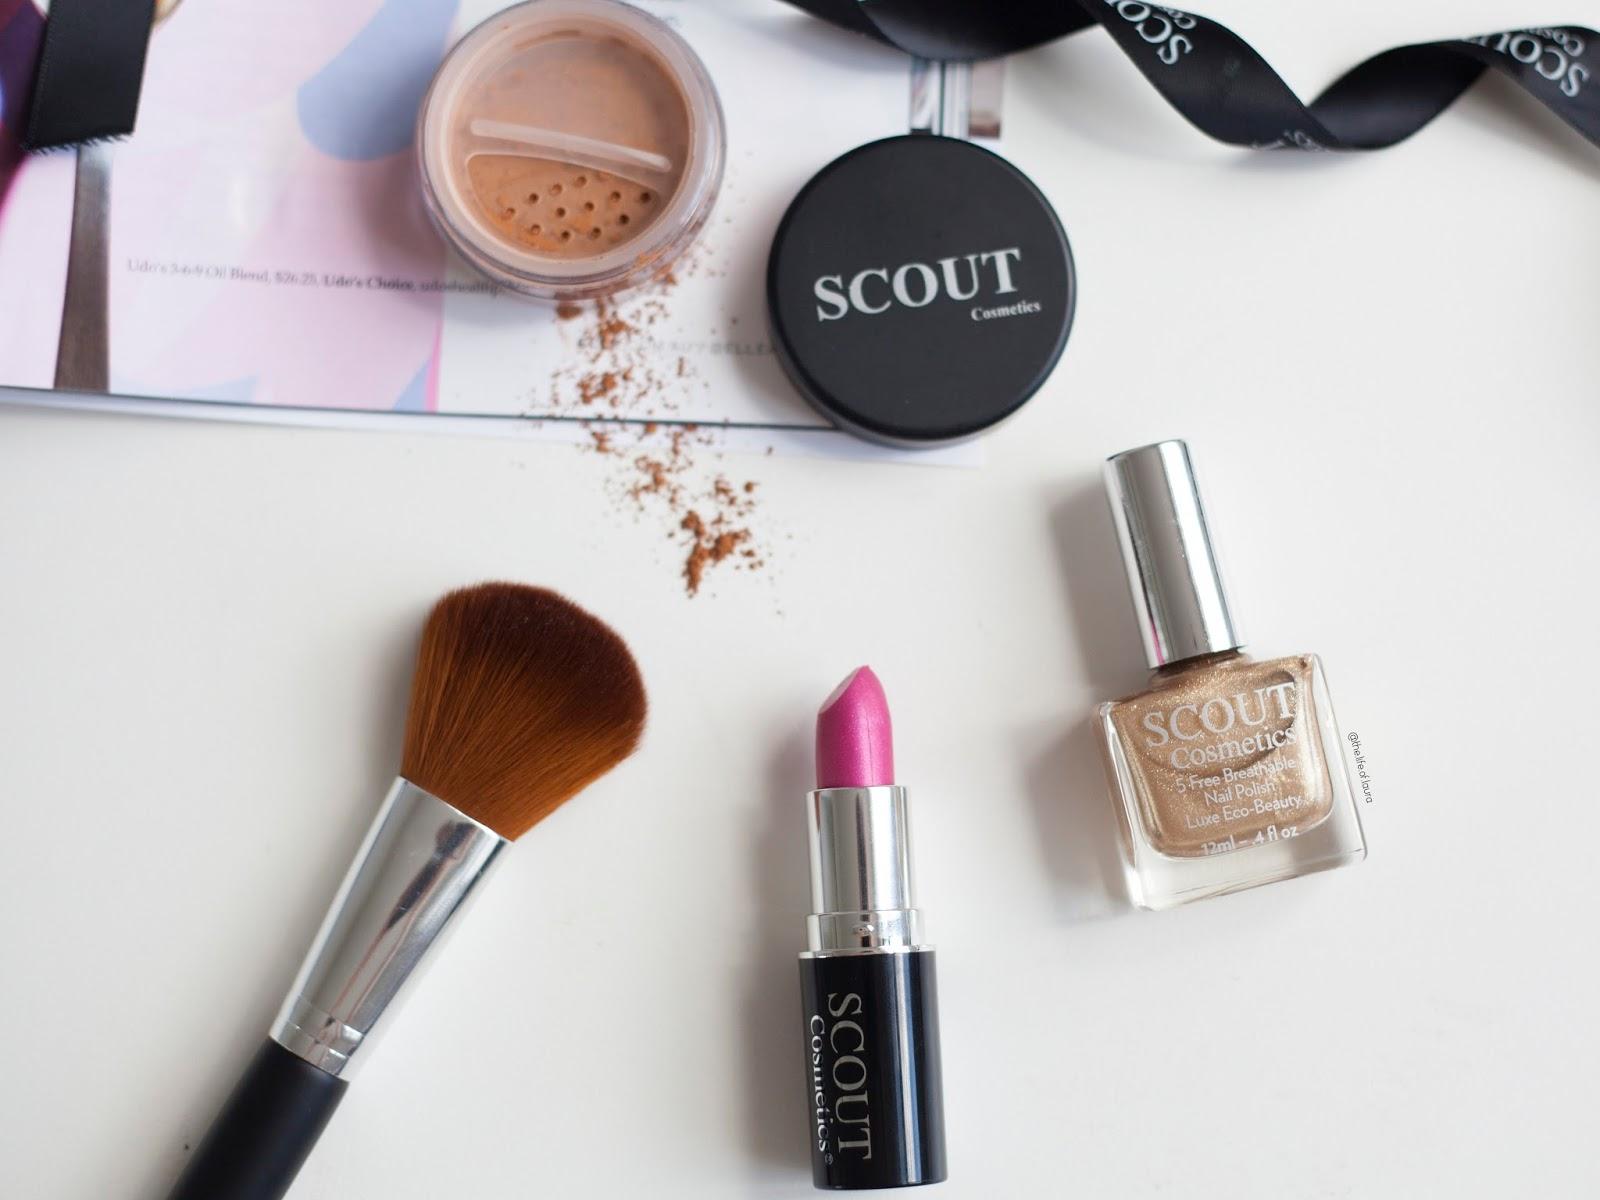 SCOUT Cosmetics Bronze Goddess